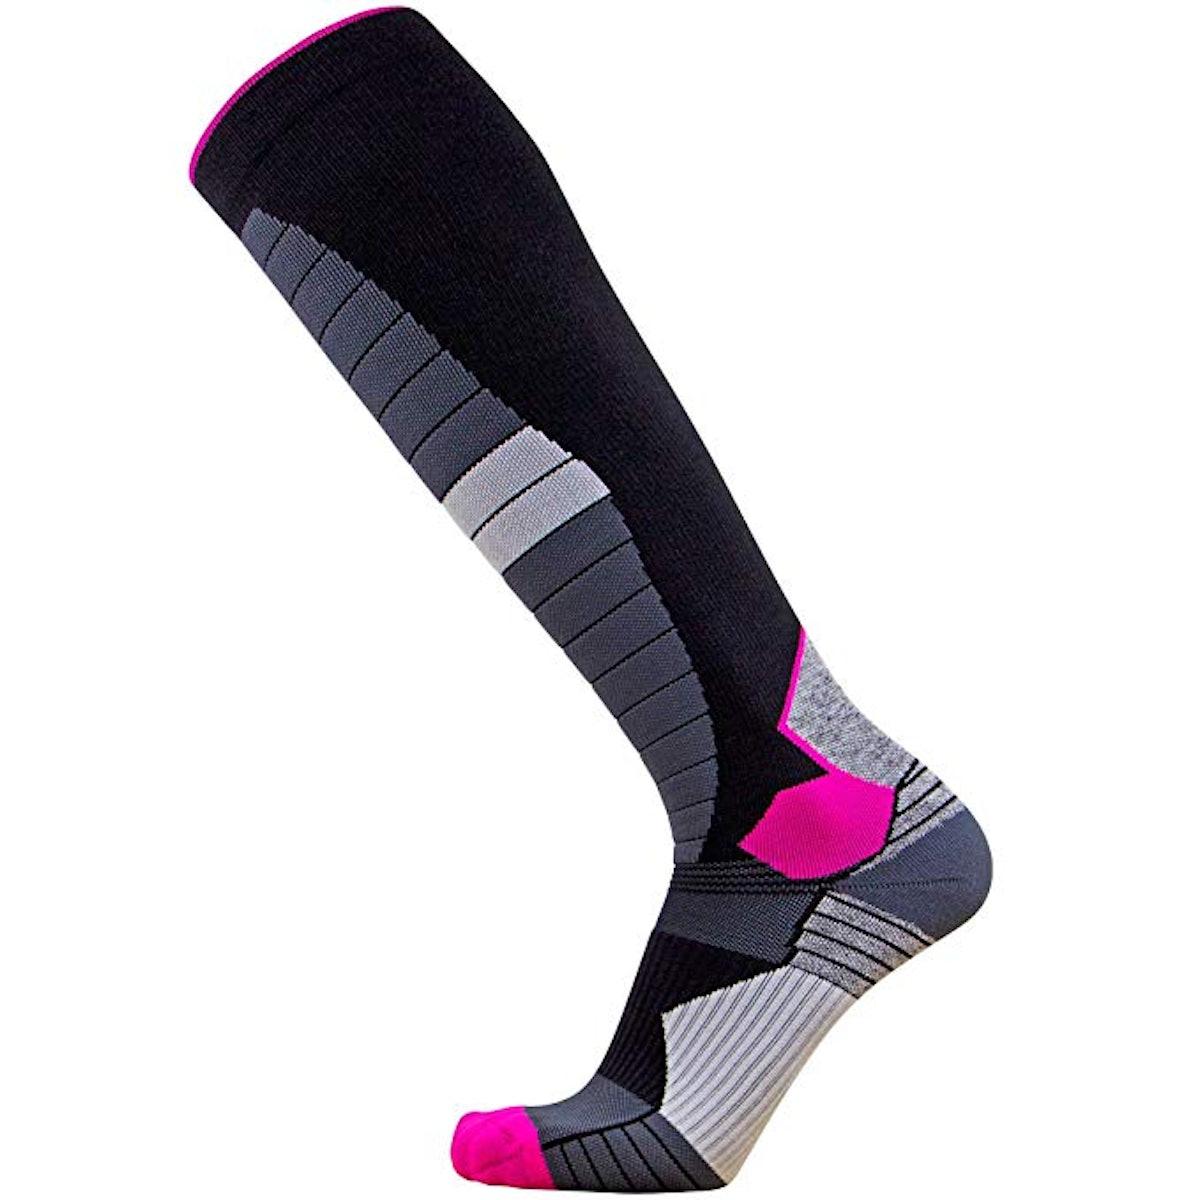 Pure Compression Thermal Snowboard Socks